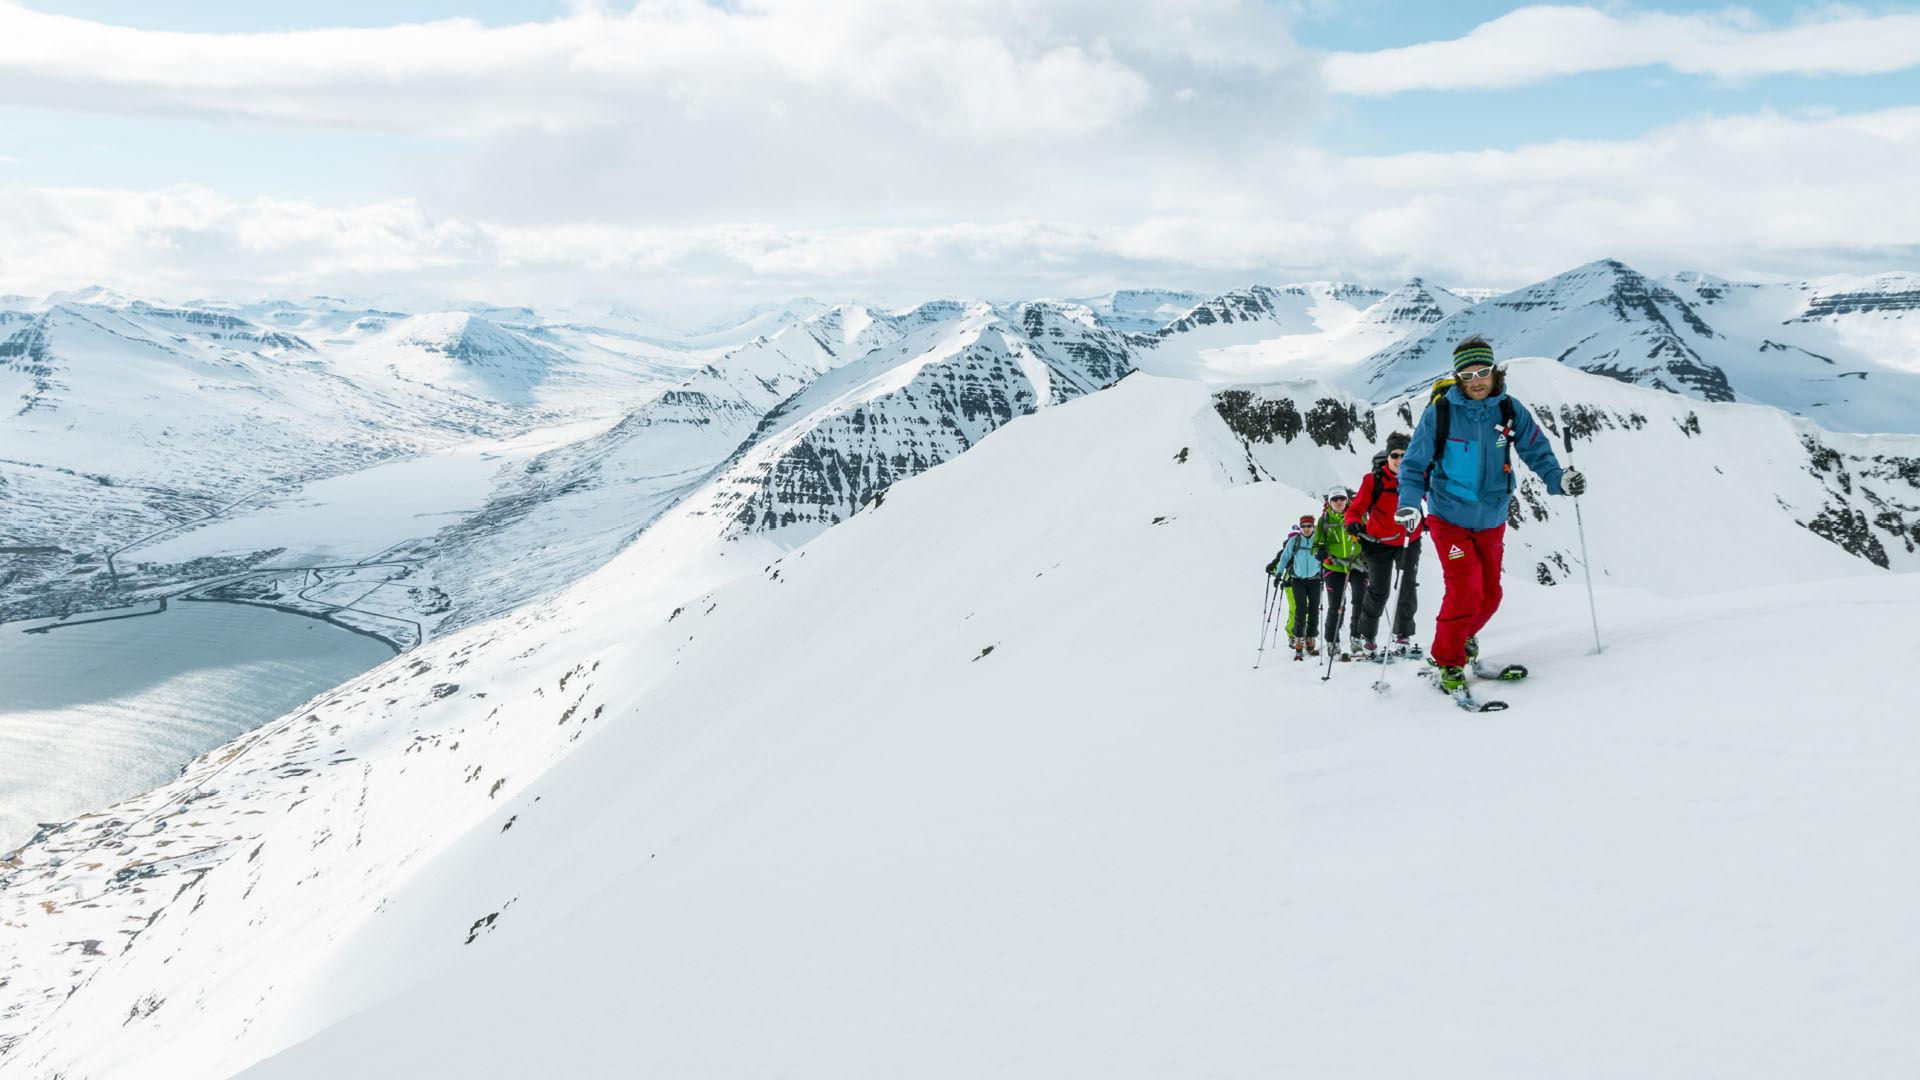 Gefuehrte Skitourenreise Nach Island Inklusive Flug